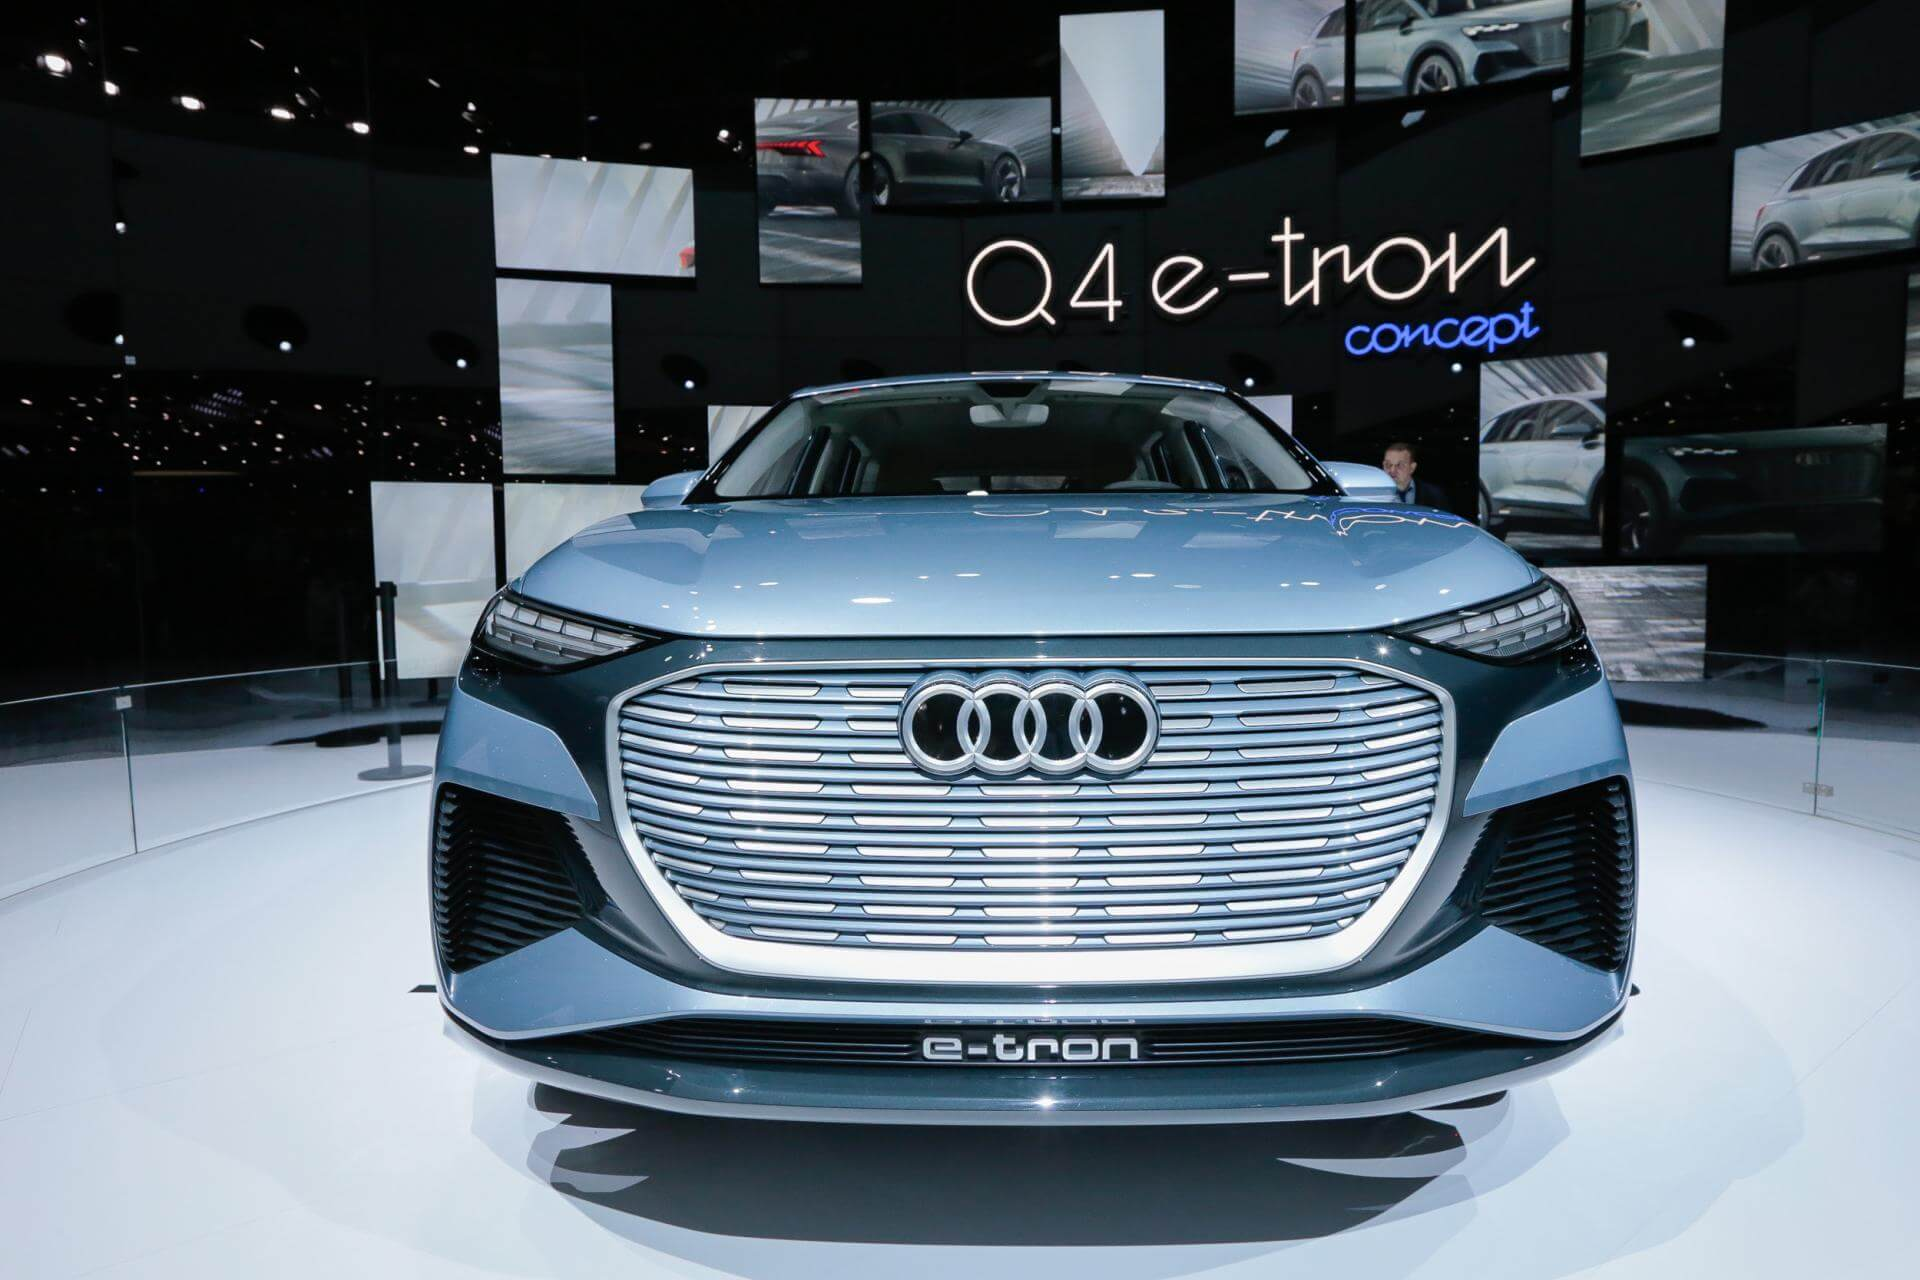 Audi Q4e-tron